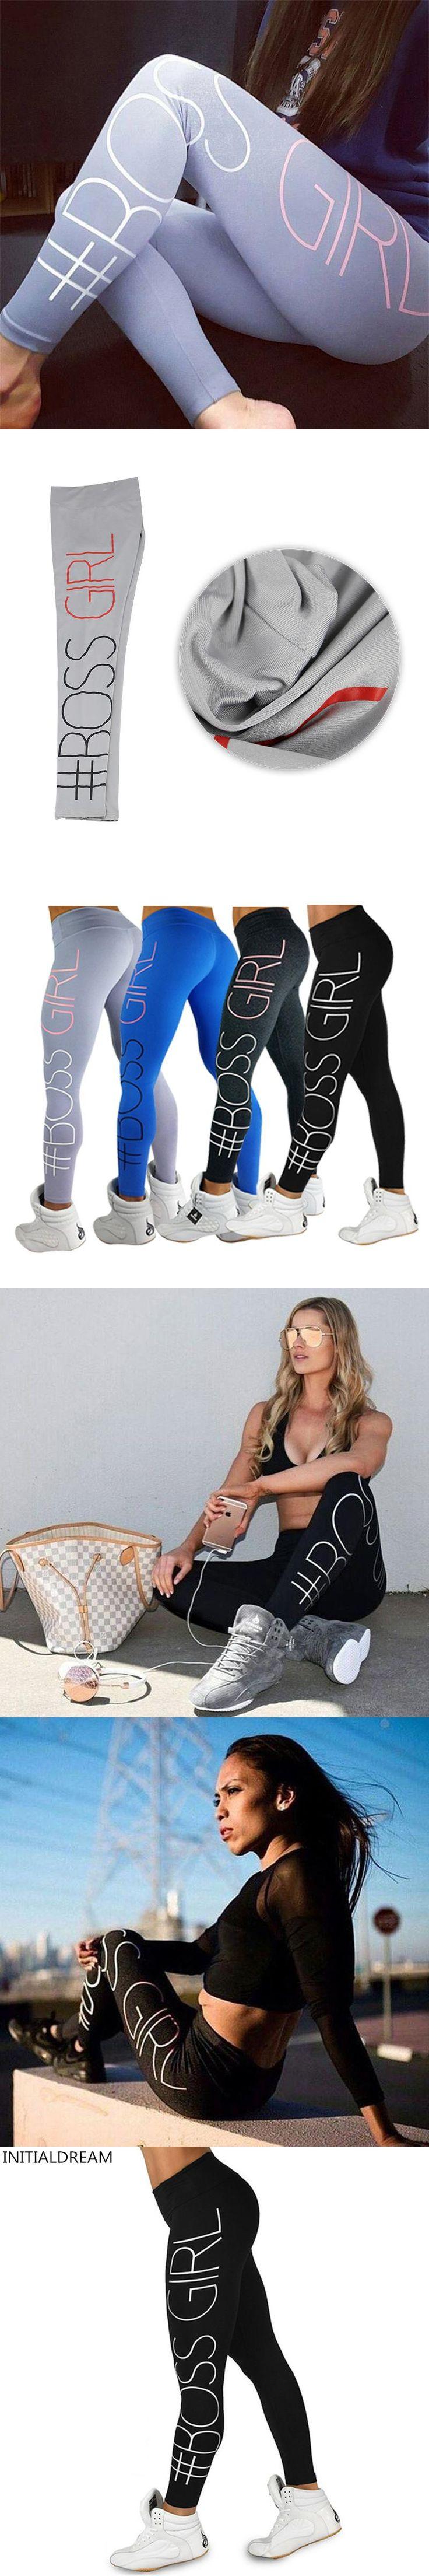 New Women's Fitness Leggings High Elastic Boss Girl Printing Workout Women Slim Trousers Breathable Legging Bodybuilding Clothes